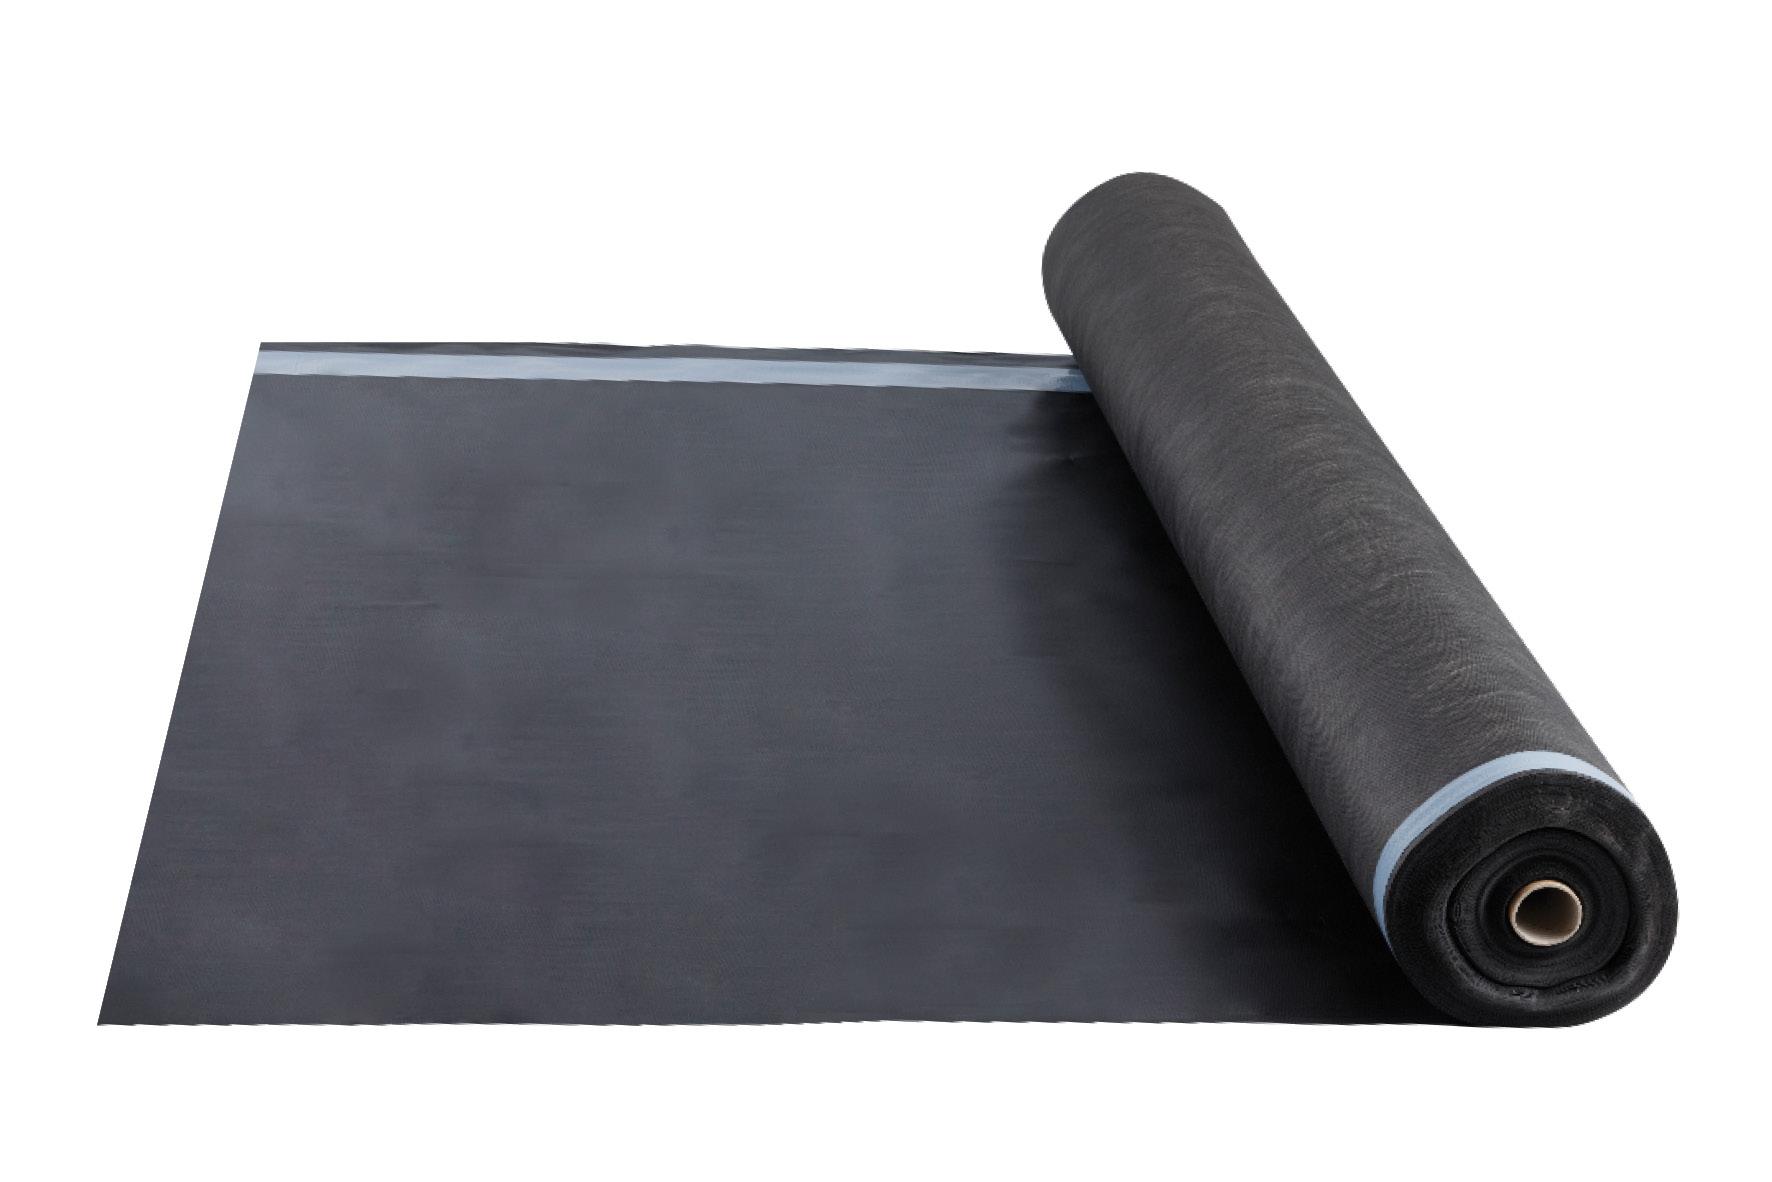 optimale l sungen f r die winddichte fassade stt. Black Bedroom Furniture Sets. Home Design Ideas